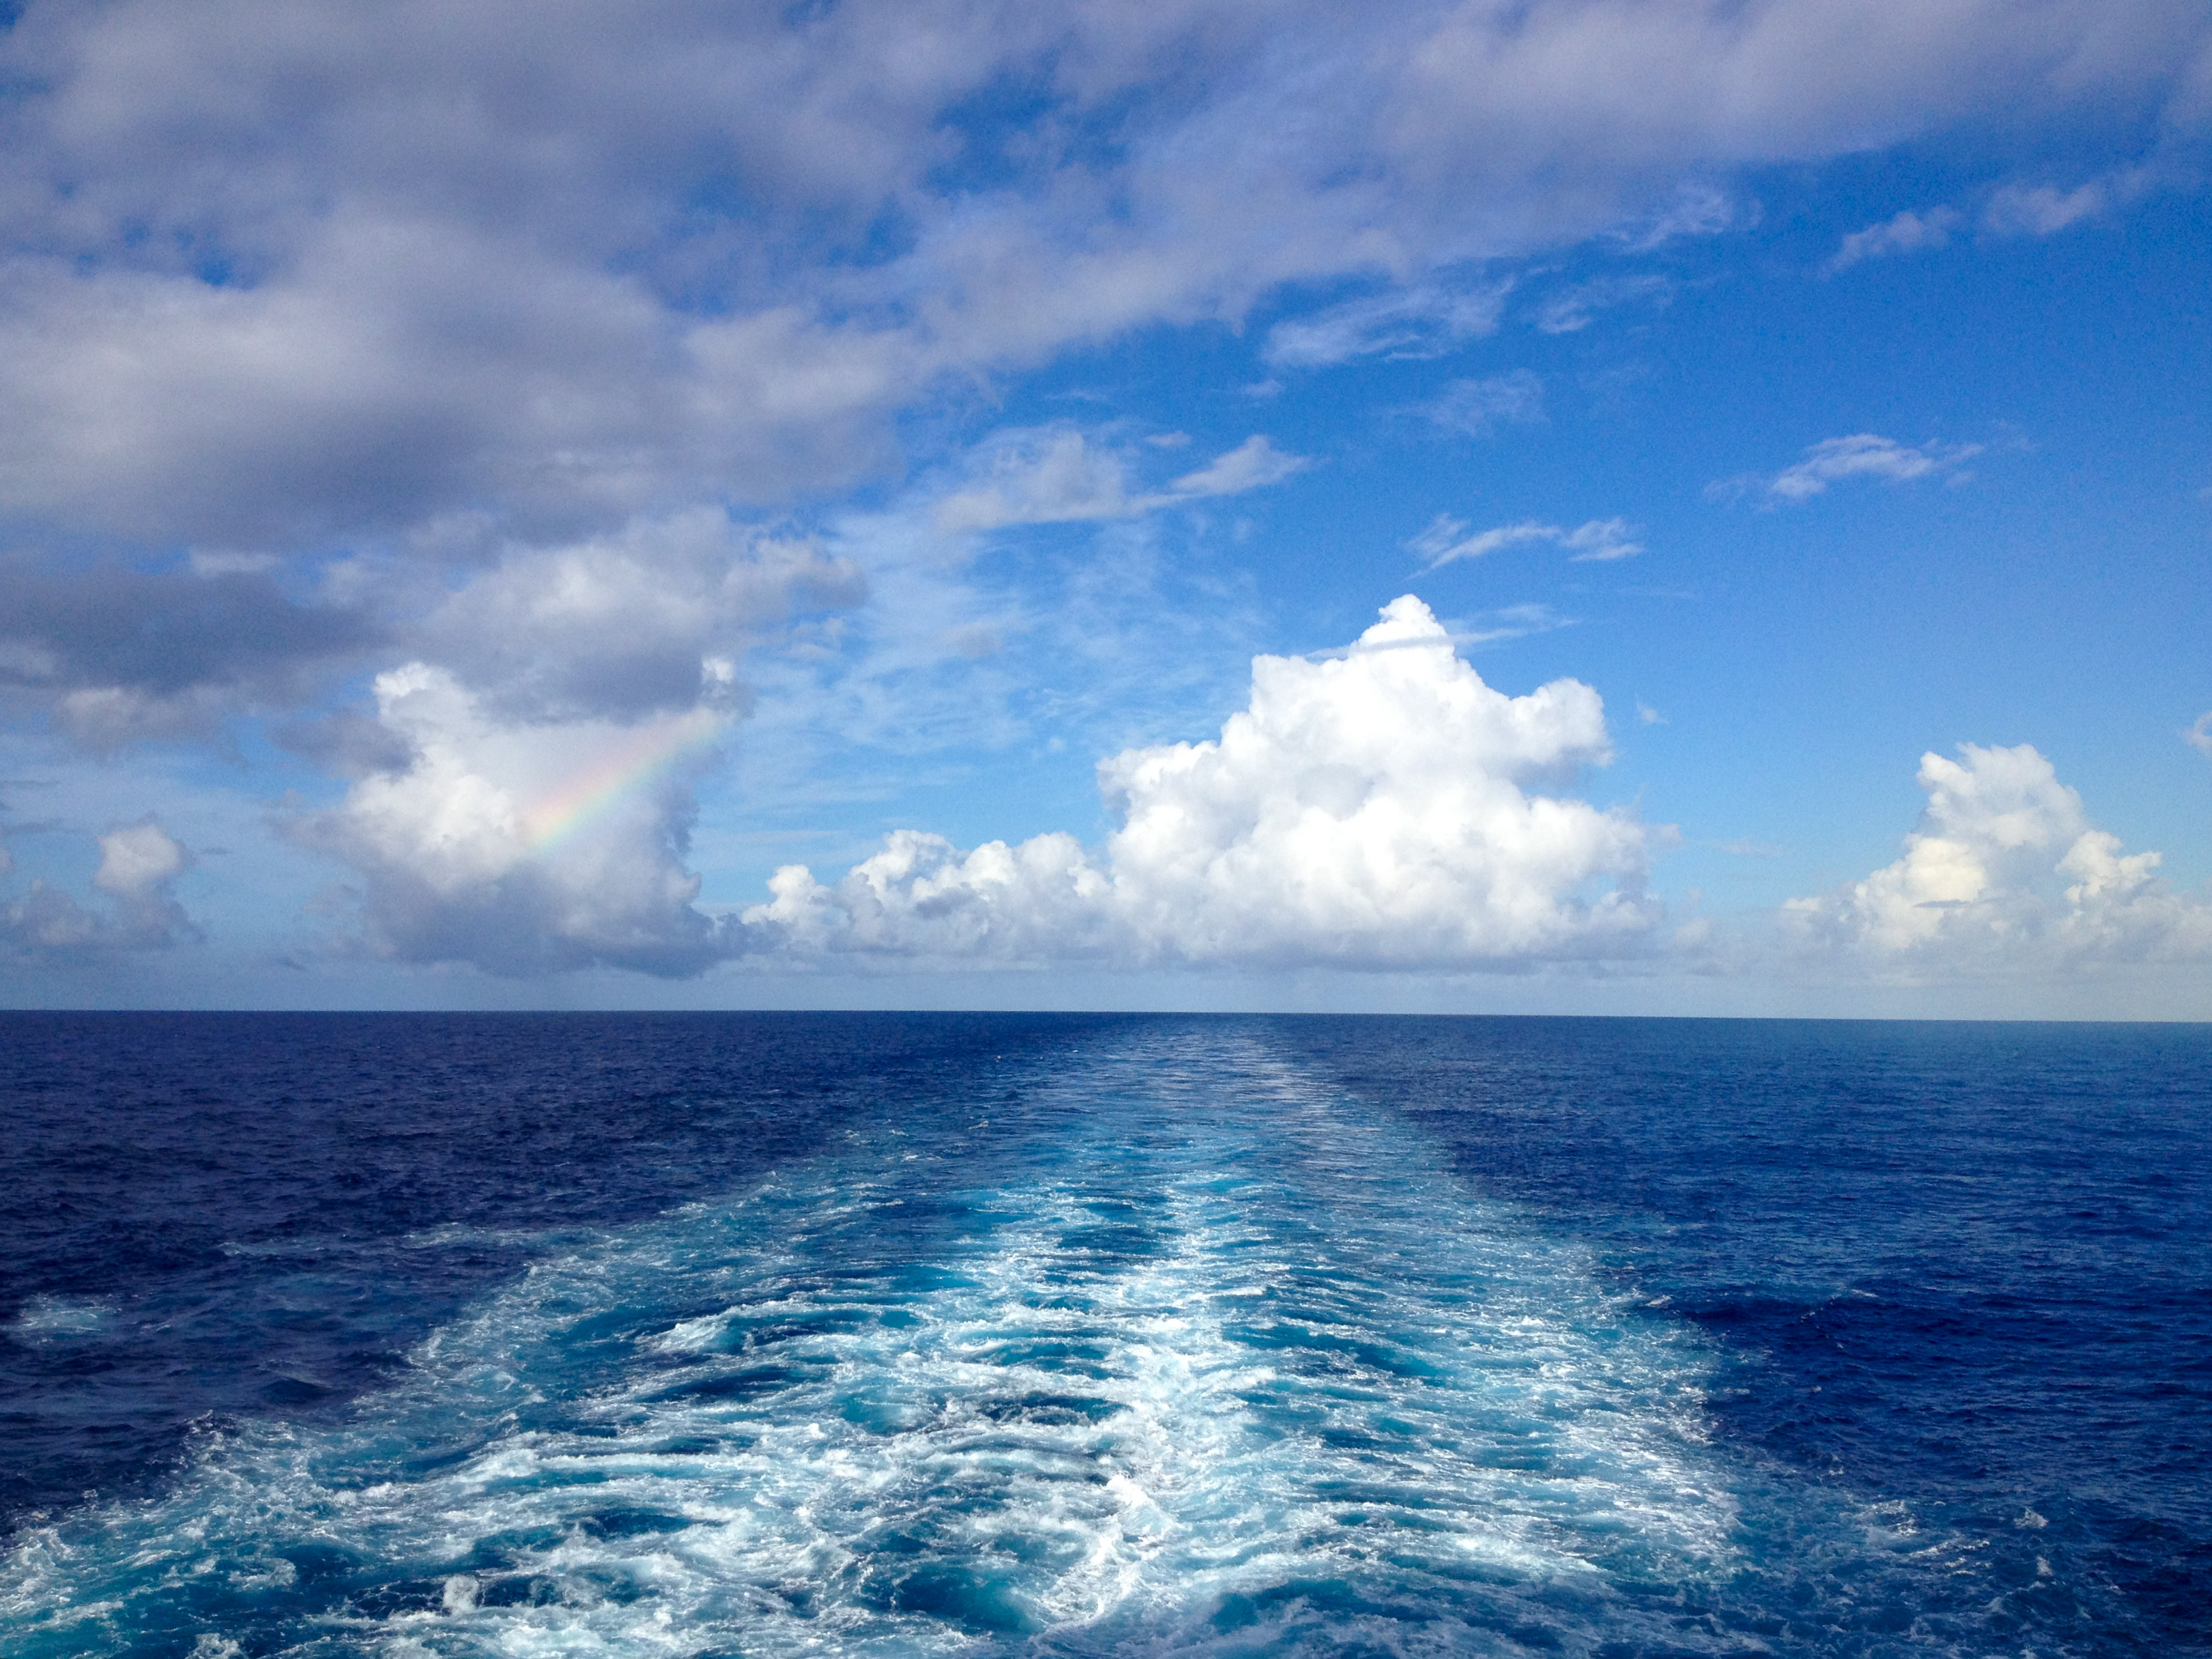 Day 9 Adventure Of The Seas Trans Atlantic Cruise